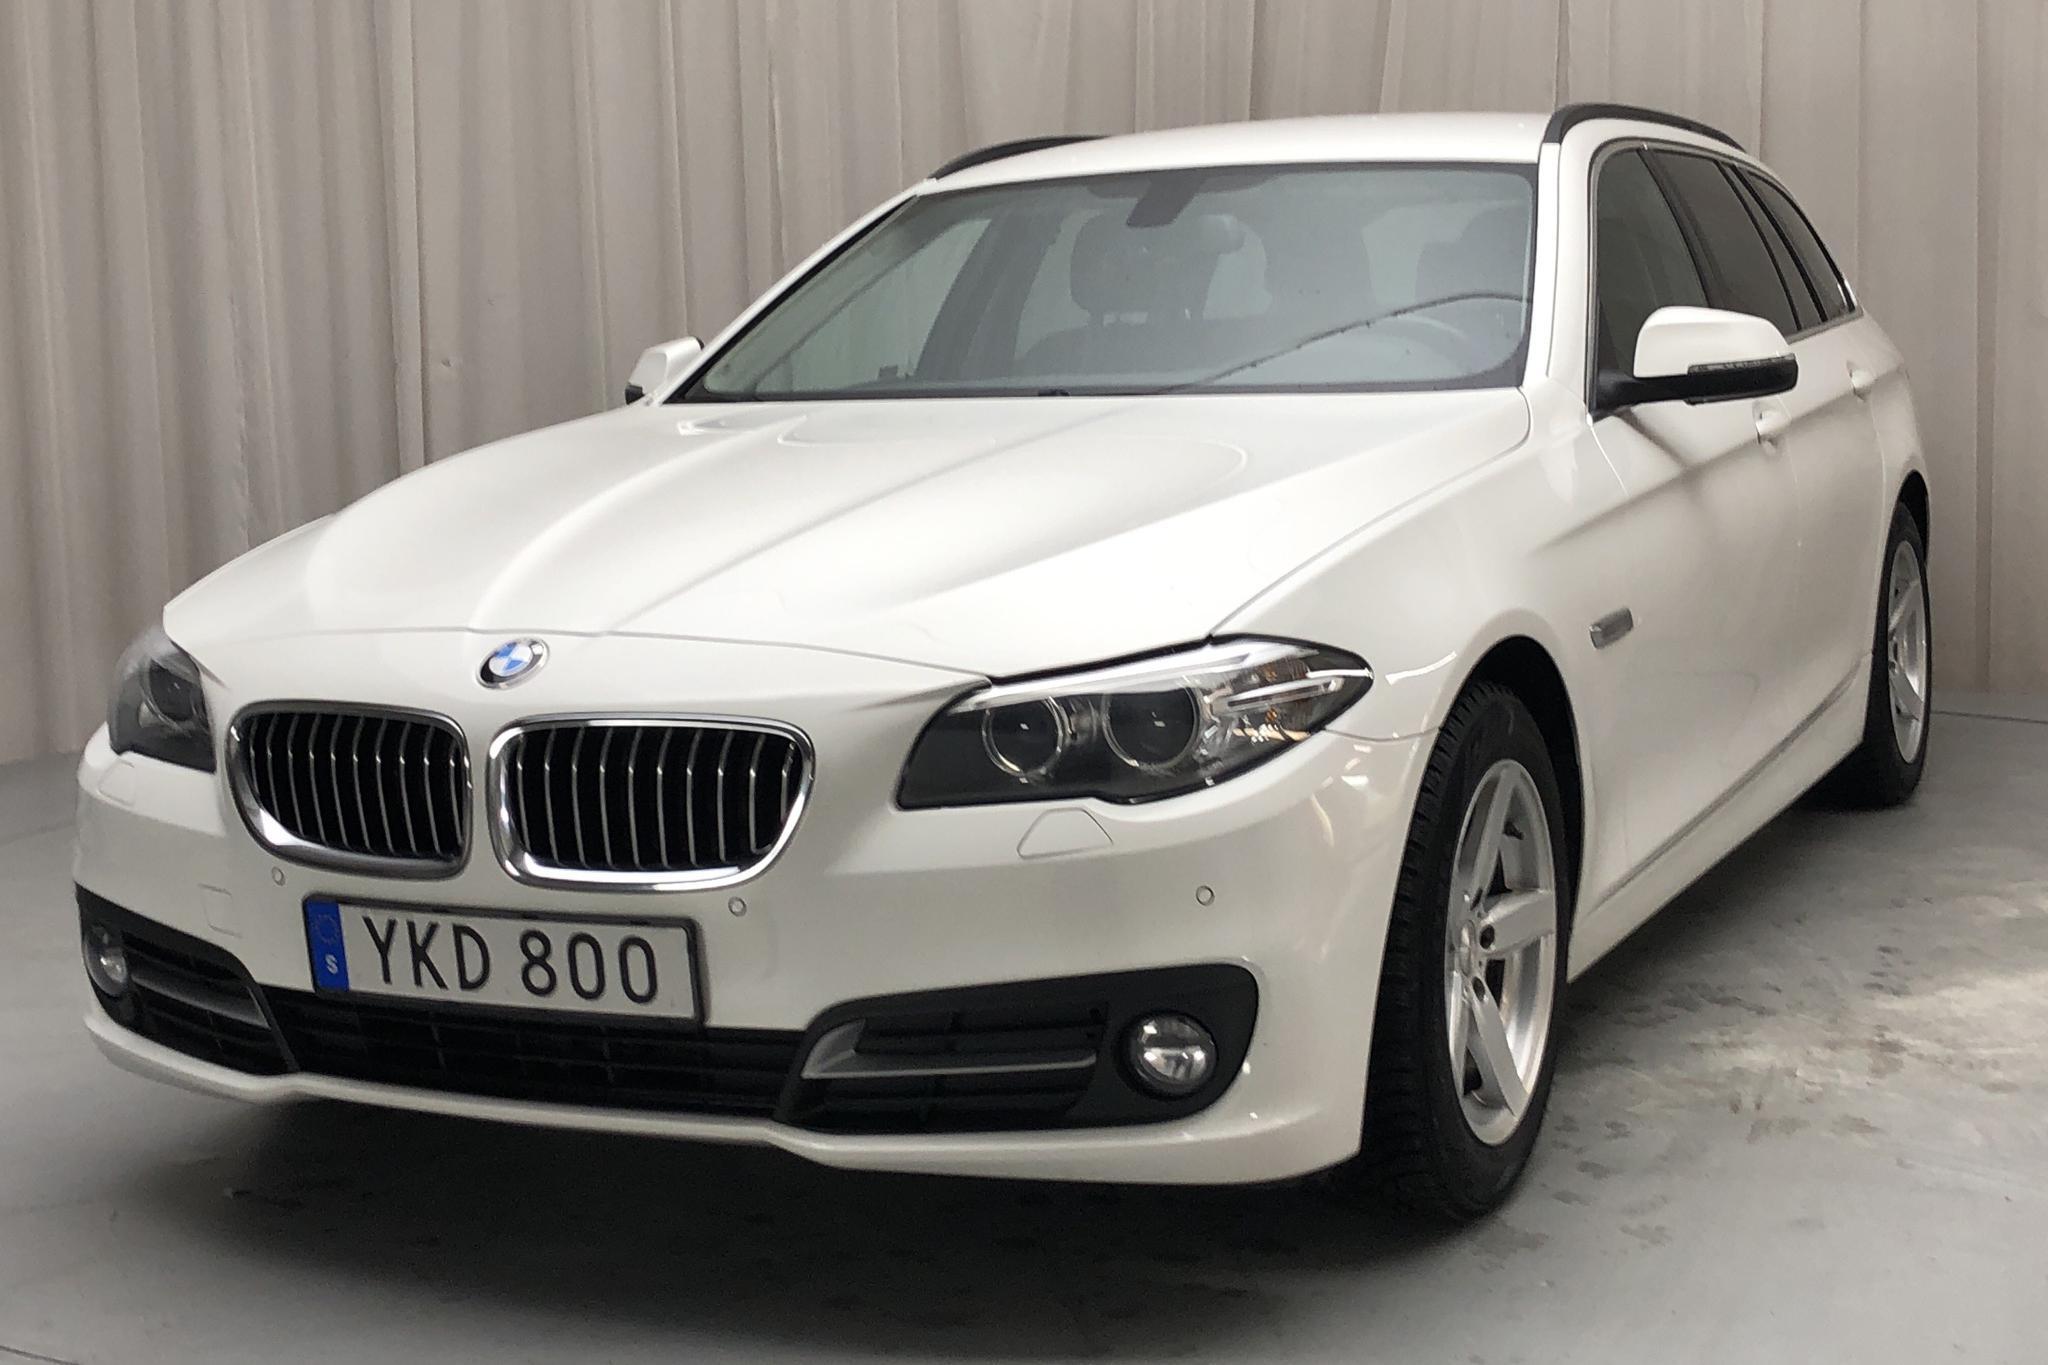 BMW 520d Touring, F11 (190hk) - 11 310 mil - Automat - vit - 2017